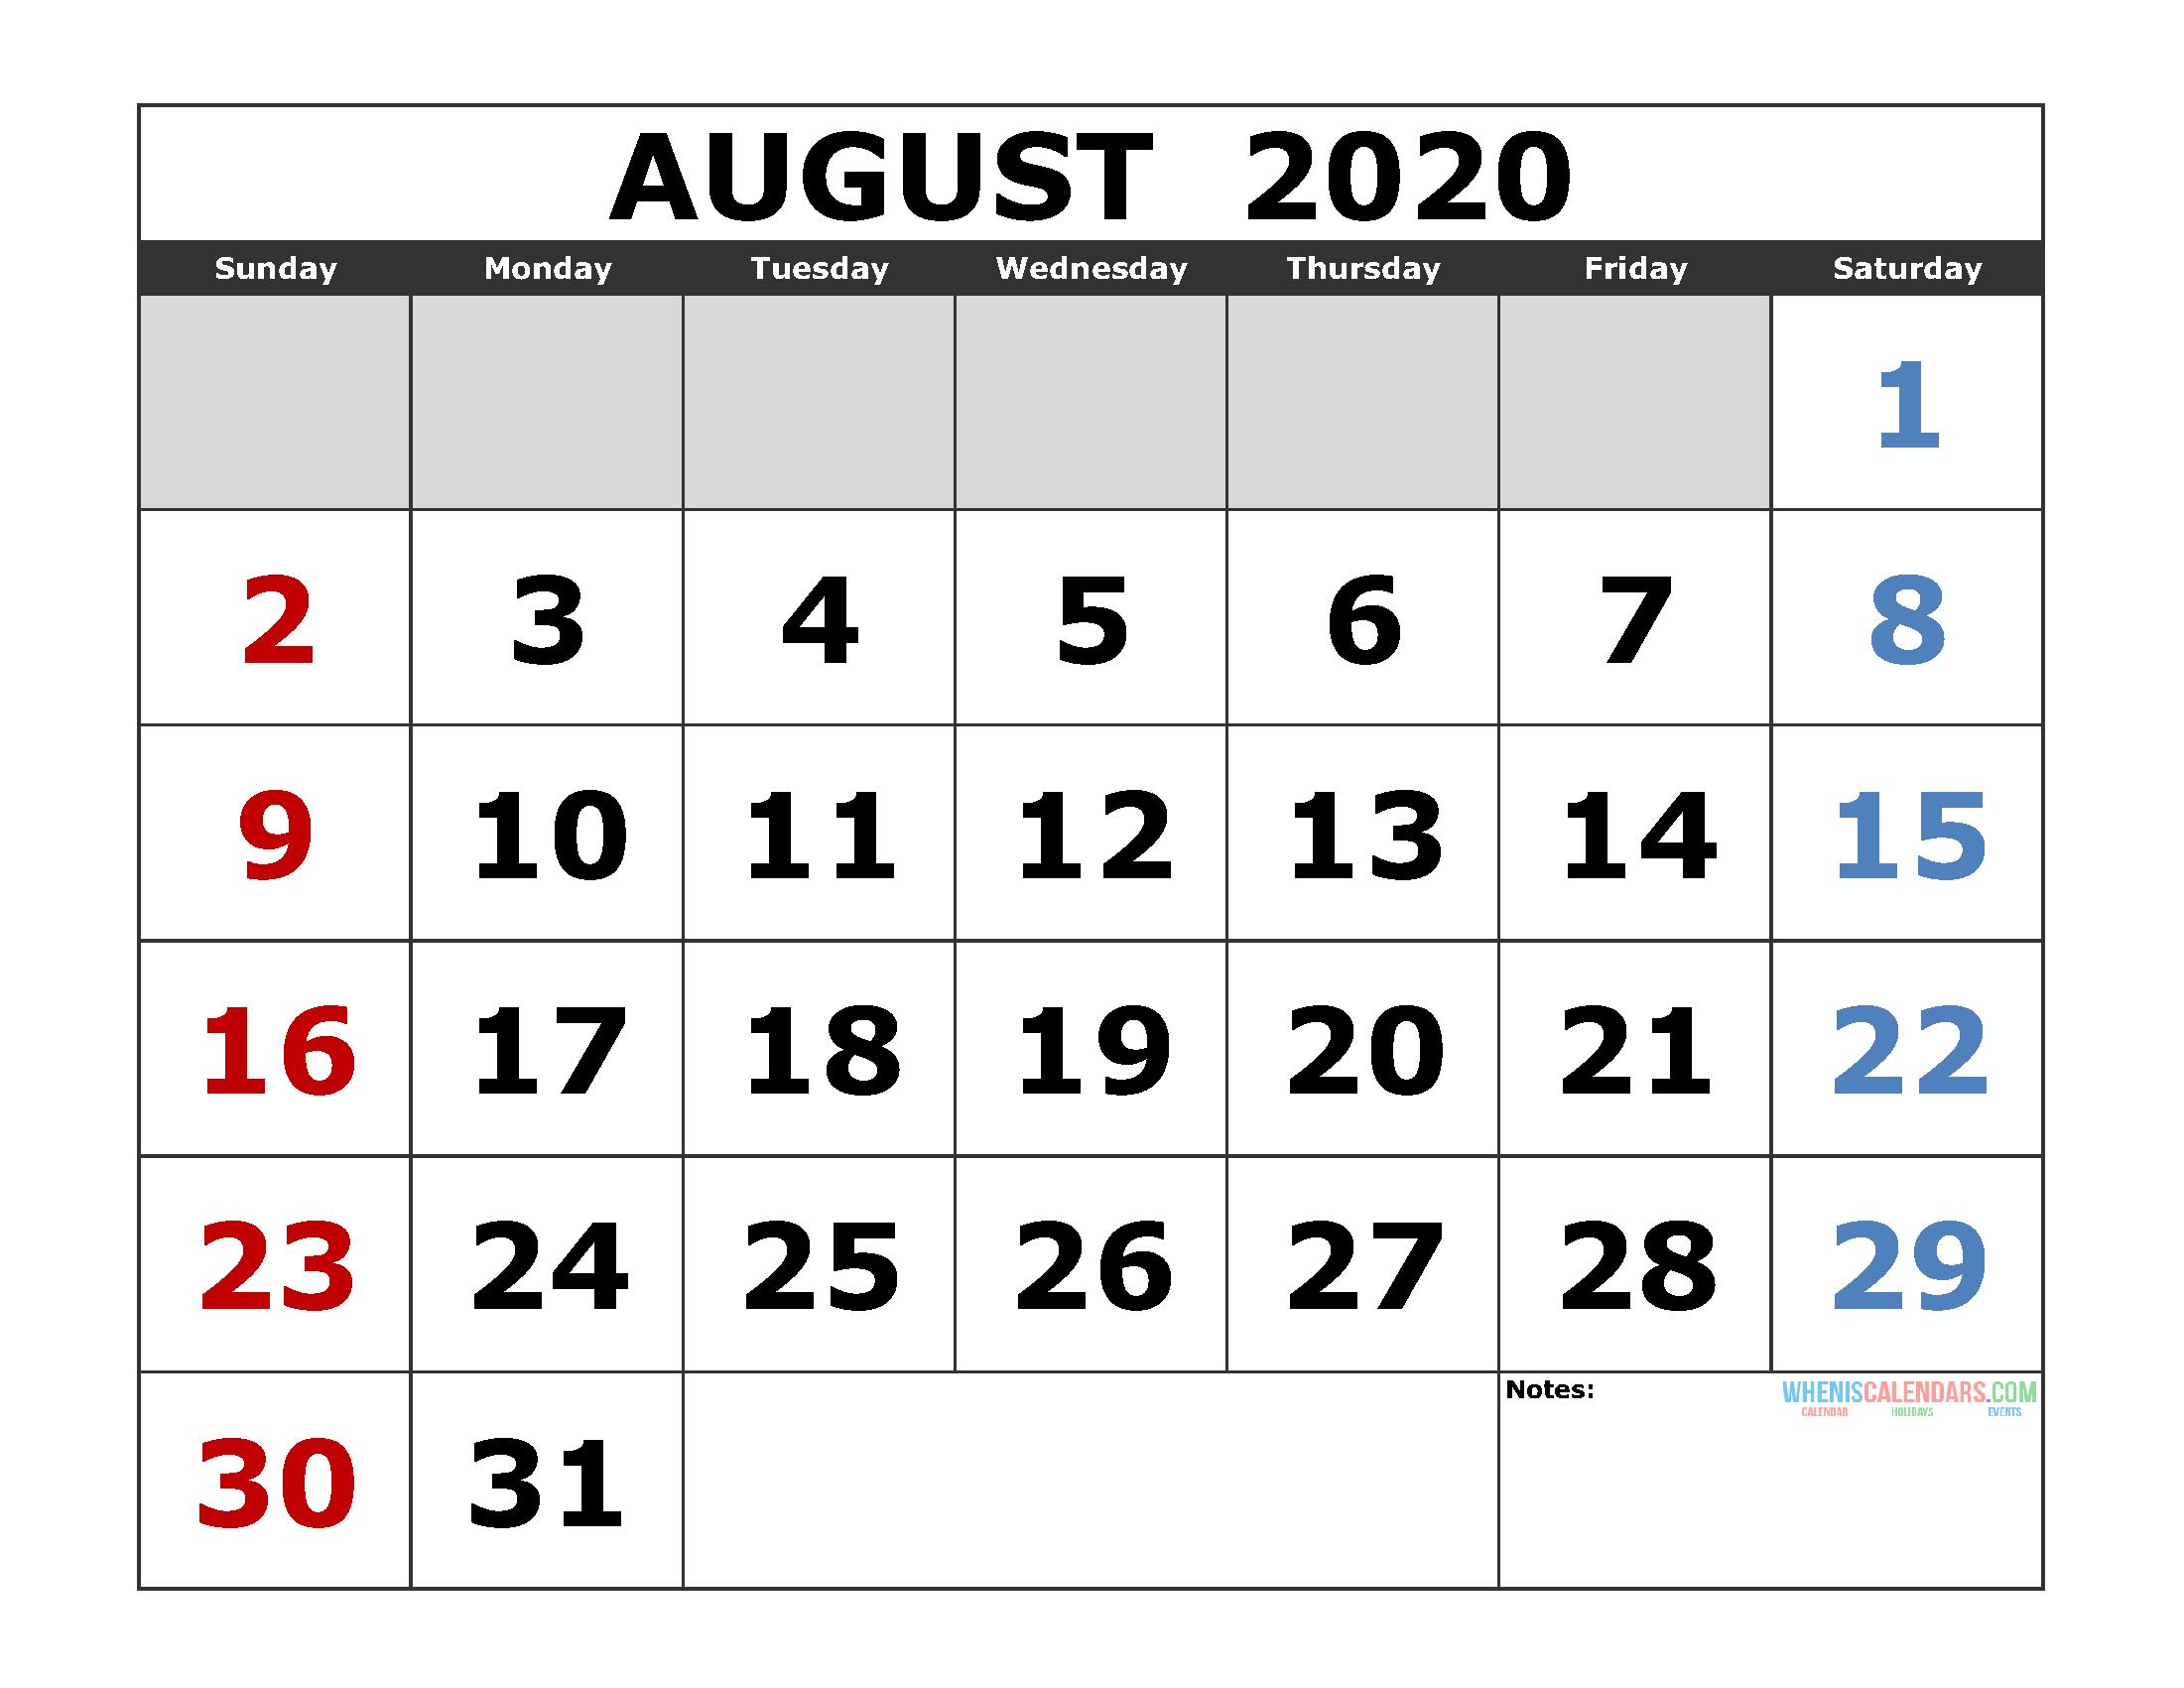 [%August 2020 Printable Calendar Template Excel, Pdf, Image [Us|2020 Calendar For August|2020 Calendar For August%]